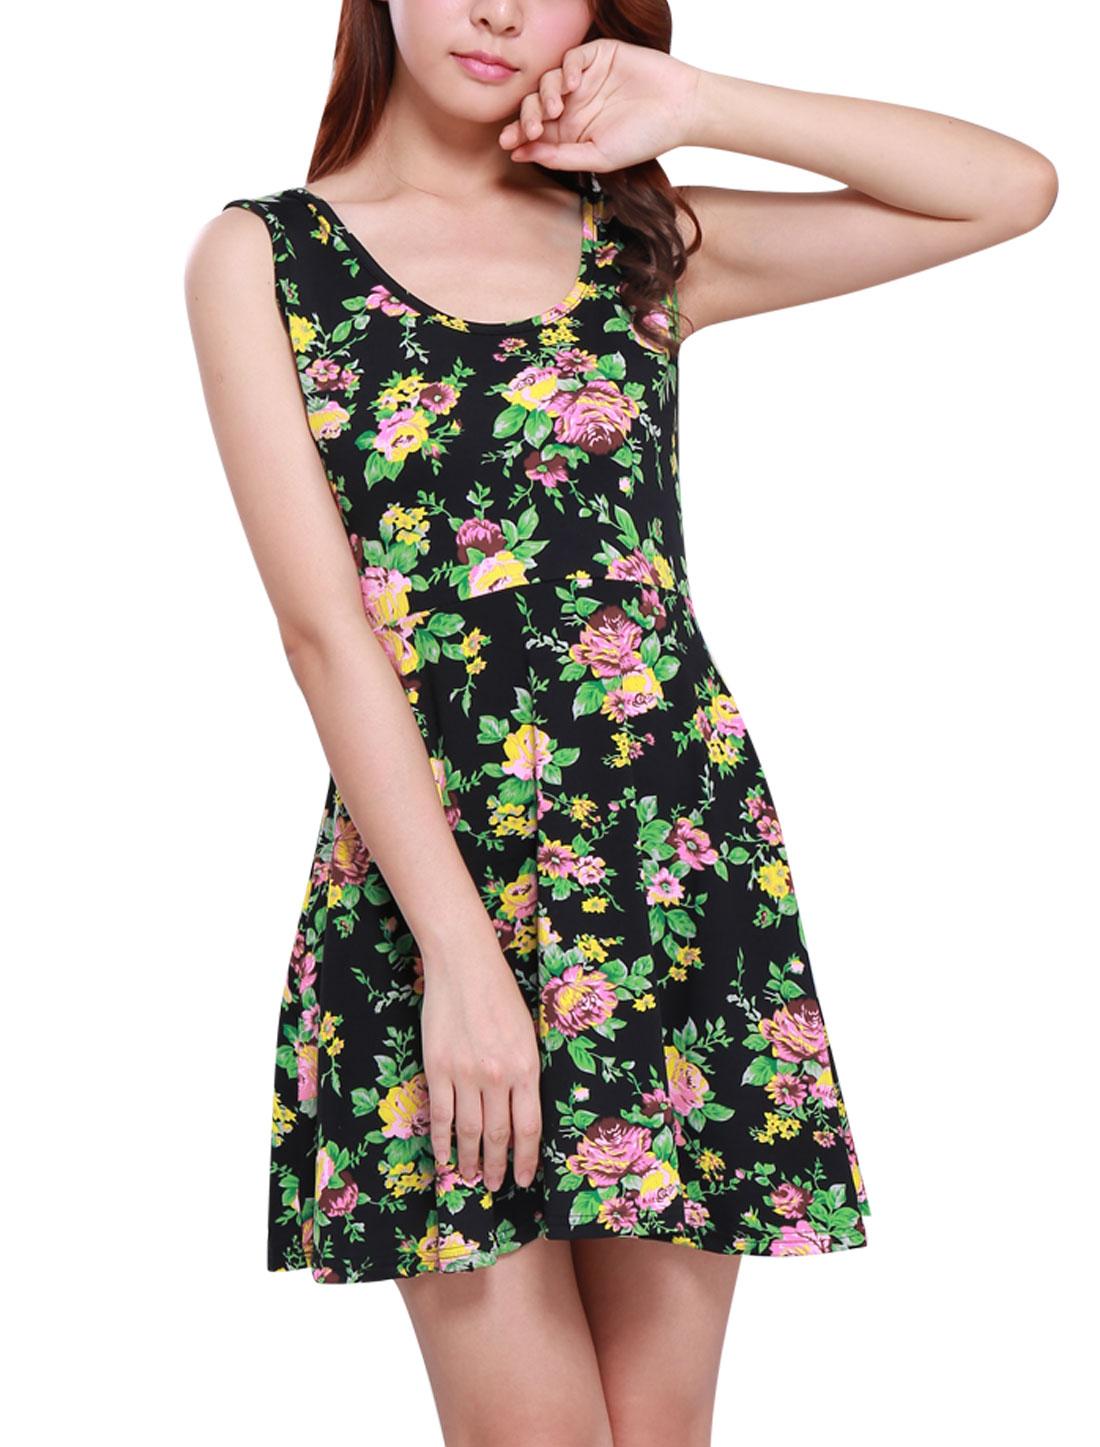 Lady U Neck Sleeveless Floral Prints Elastic Sexy Skater Dress Black Green S